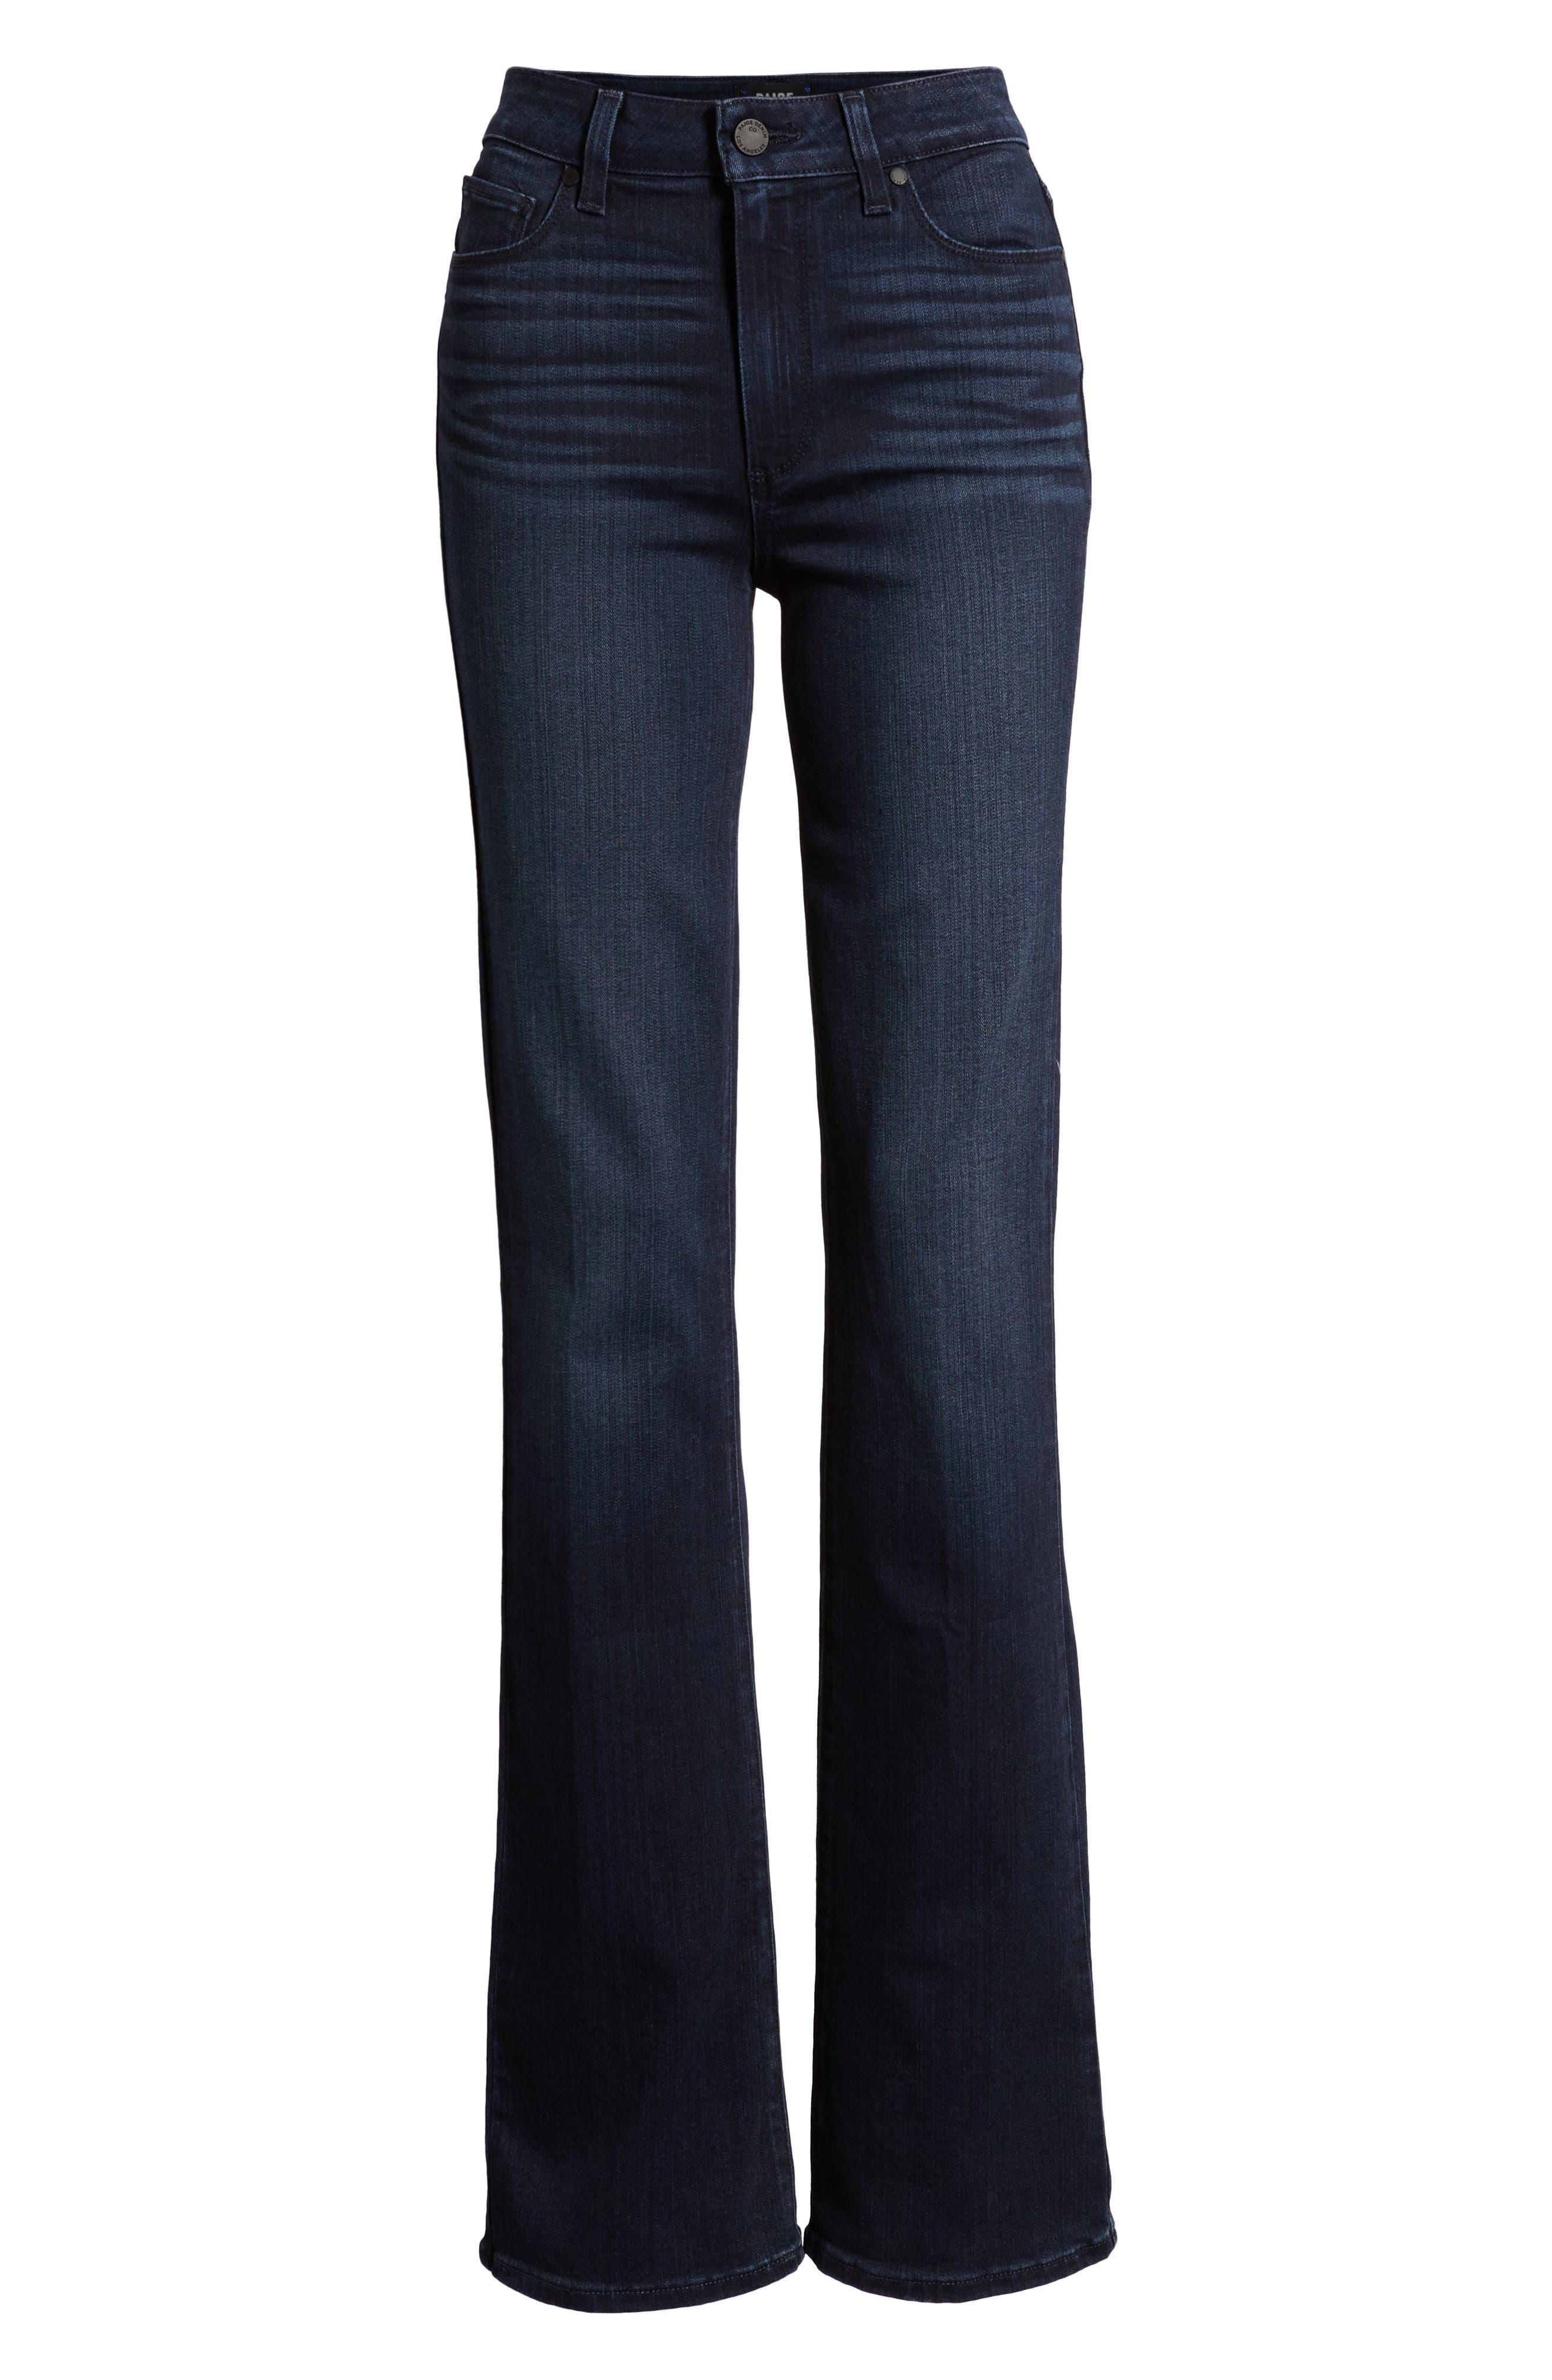 PAIGE, Manhattan High Waist Bootcut Jeans, Alternate thumbnail 7, color, ROSEVILLE